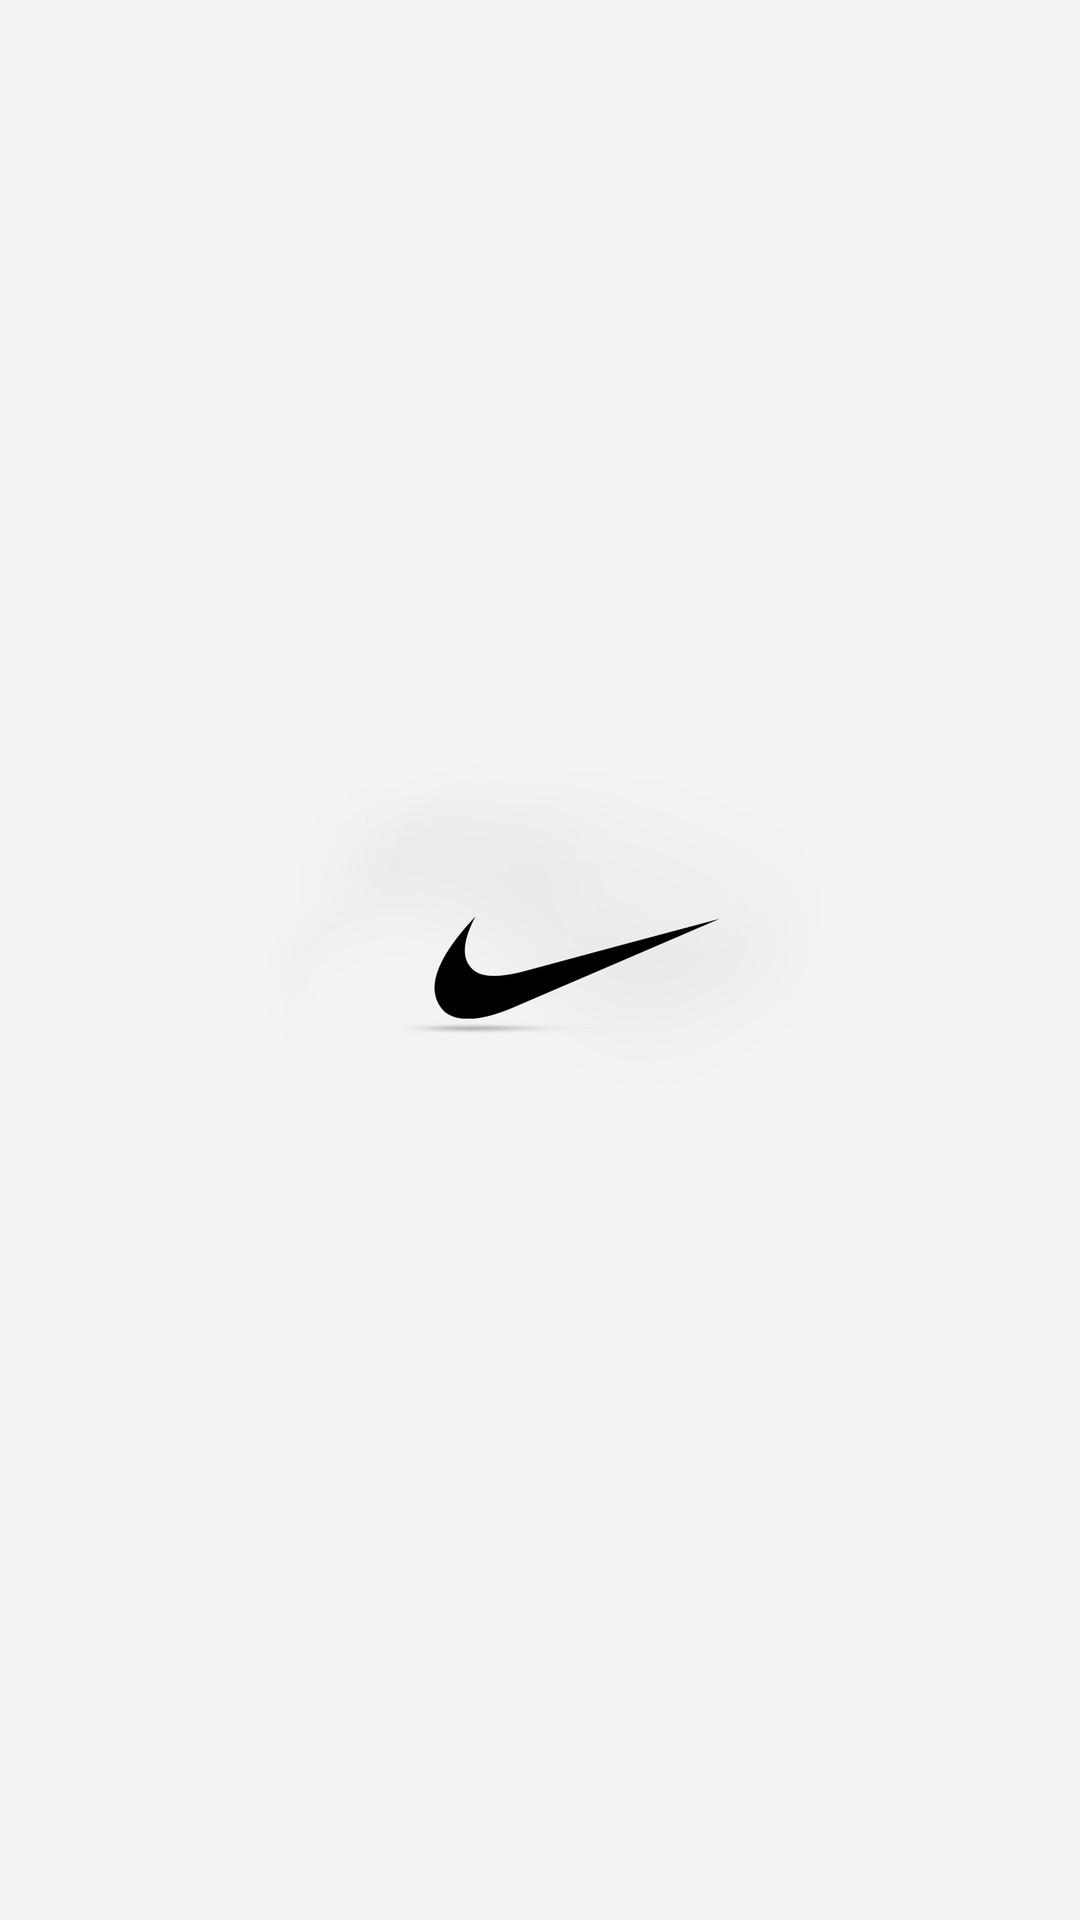 Nike Symbol Wallpaper 64 Images